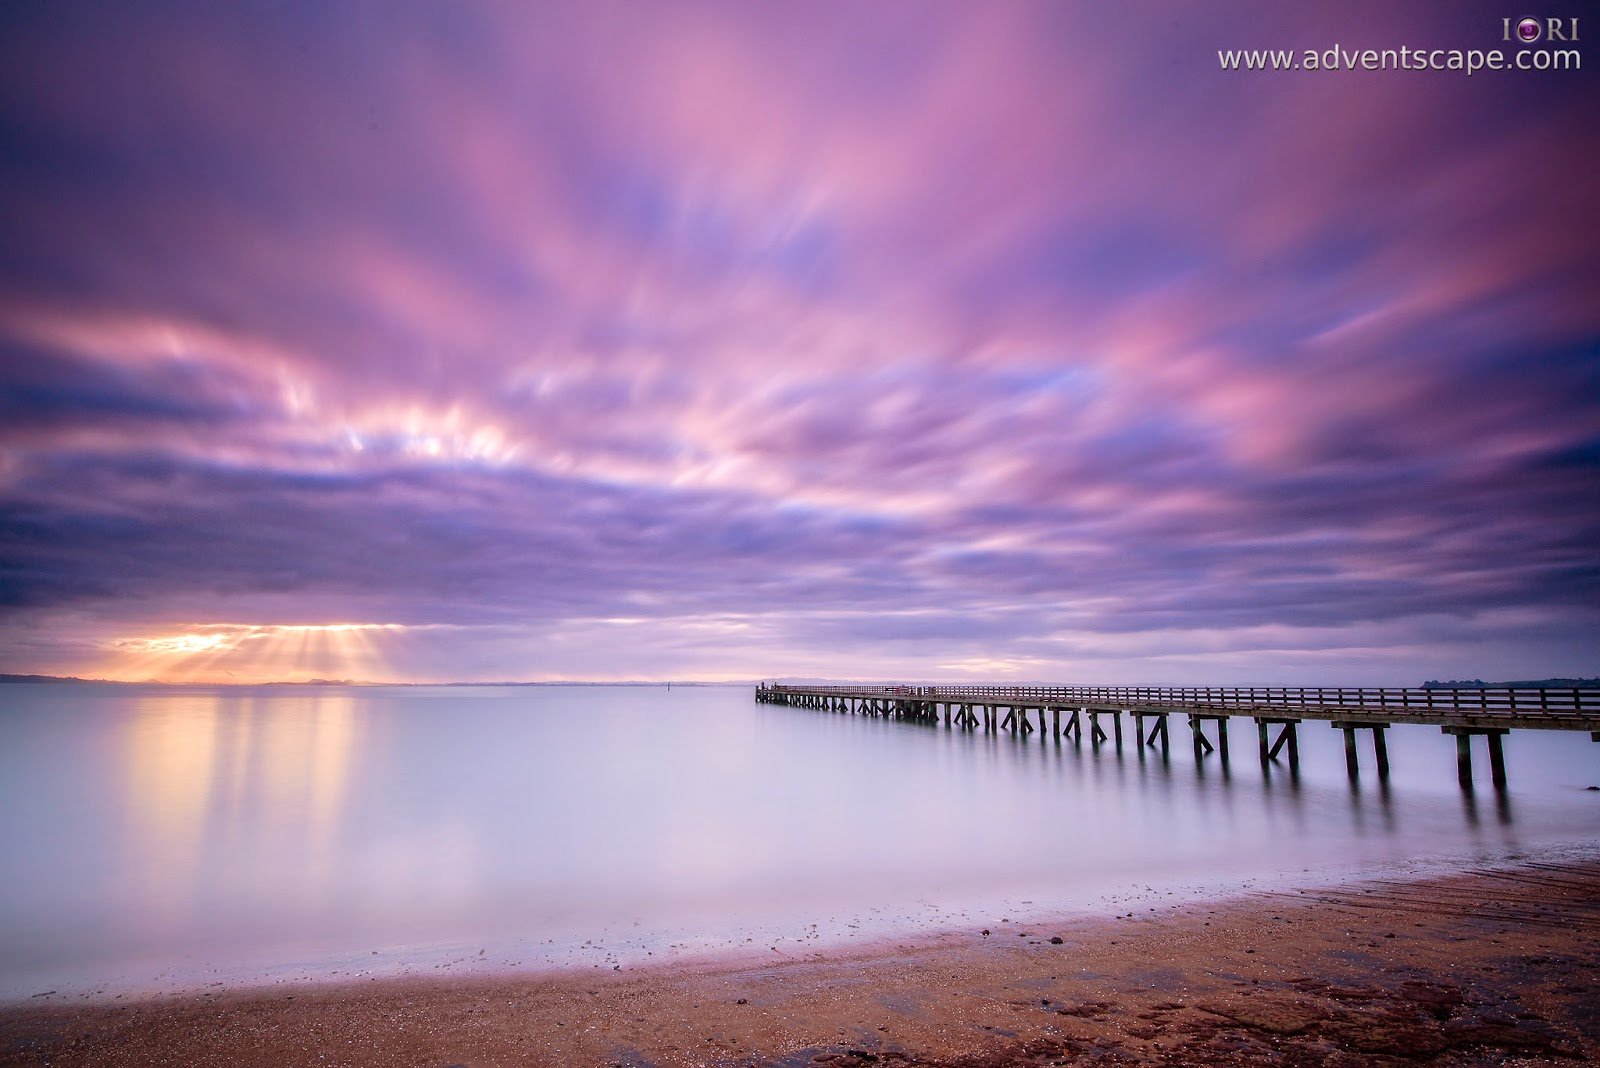 Philip Avellana, iori, adventscape, Cornwallis, jetty, seascape, landscape, North Island, New Zealand, fine art, sunrise, camera left, left side